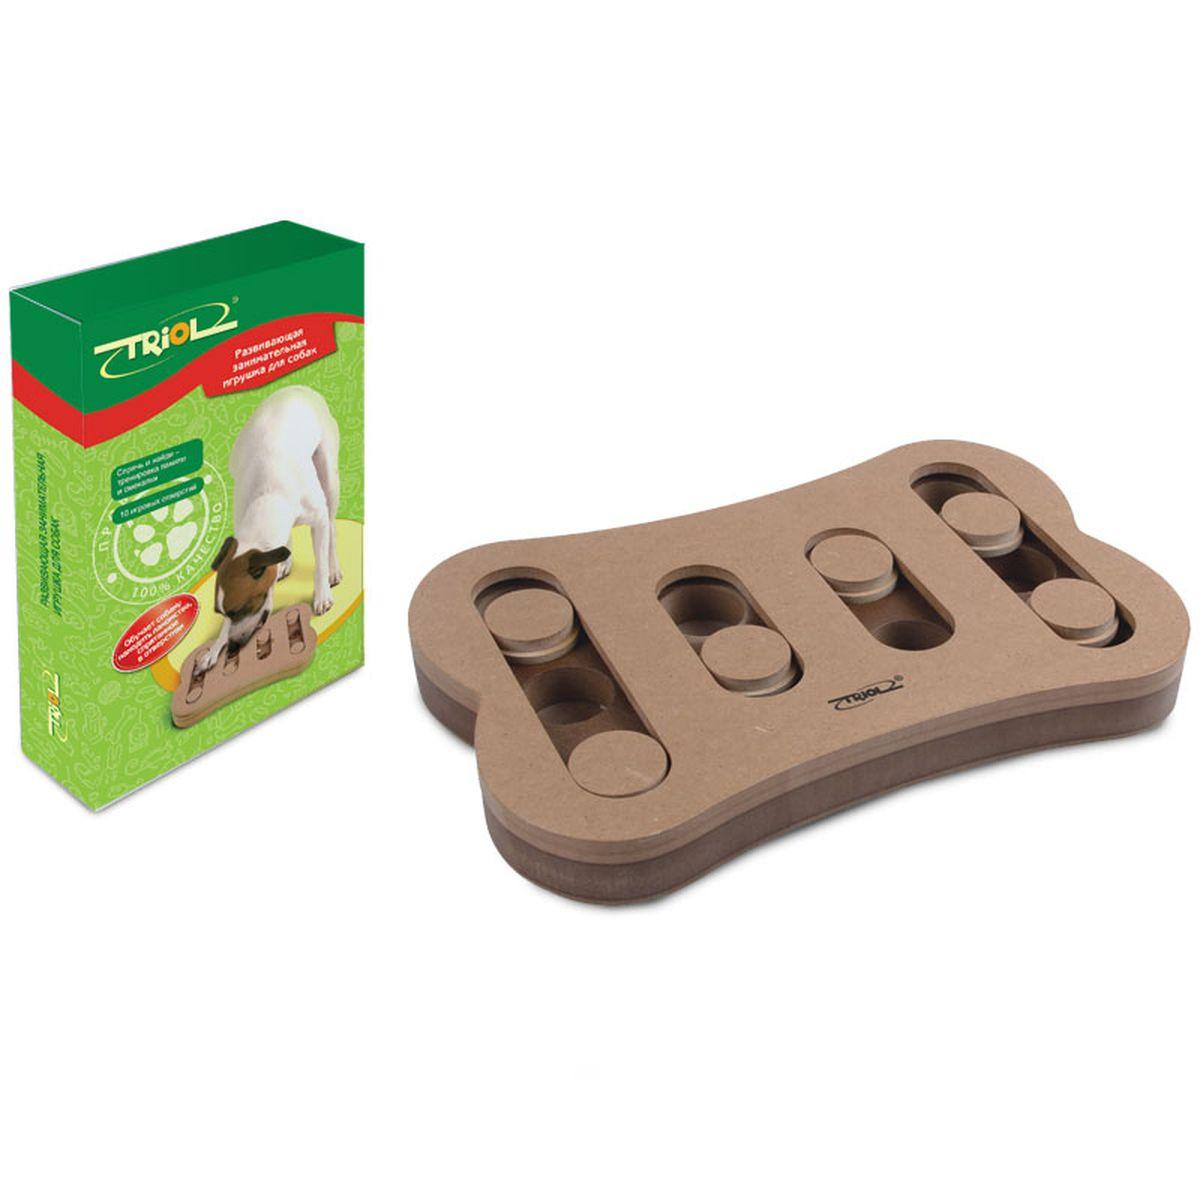 Игрушка для собак Triol Спрячь и найди, 29,5 х 19 х 3,4 см игрушка головоломка для собак i p t s smarty 30x19x2 5см